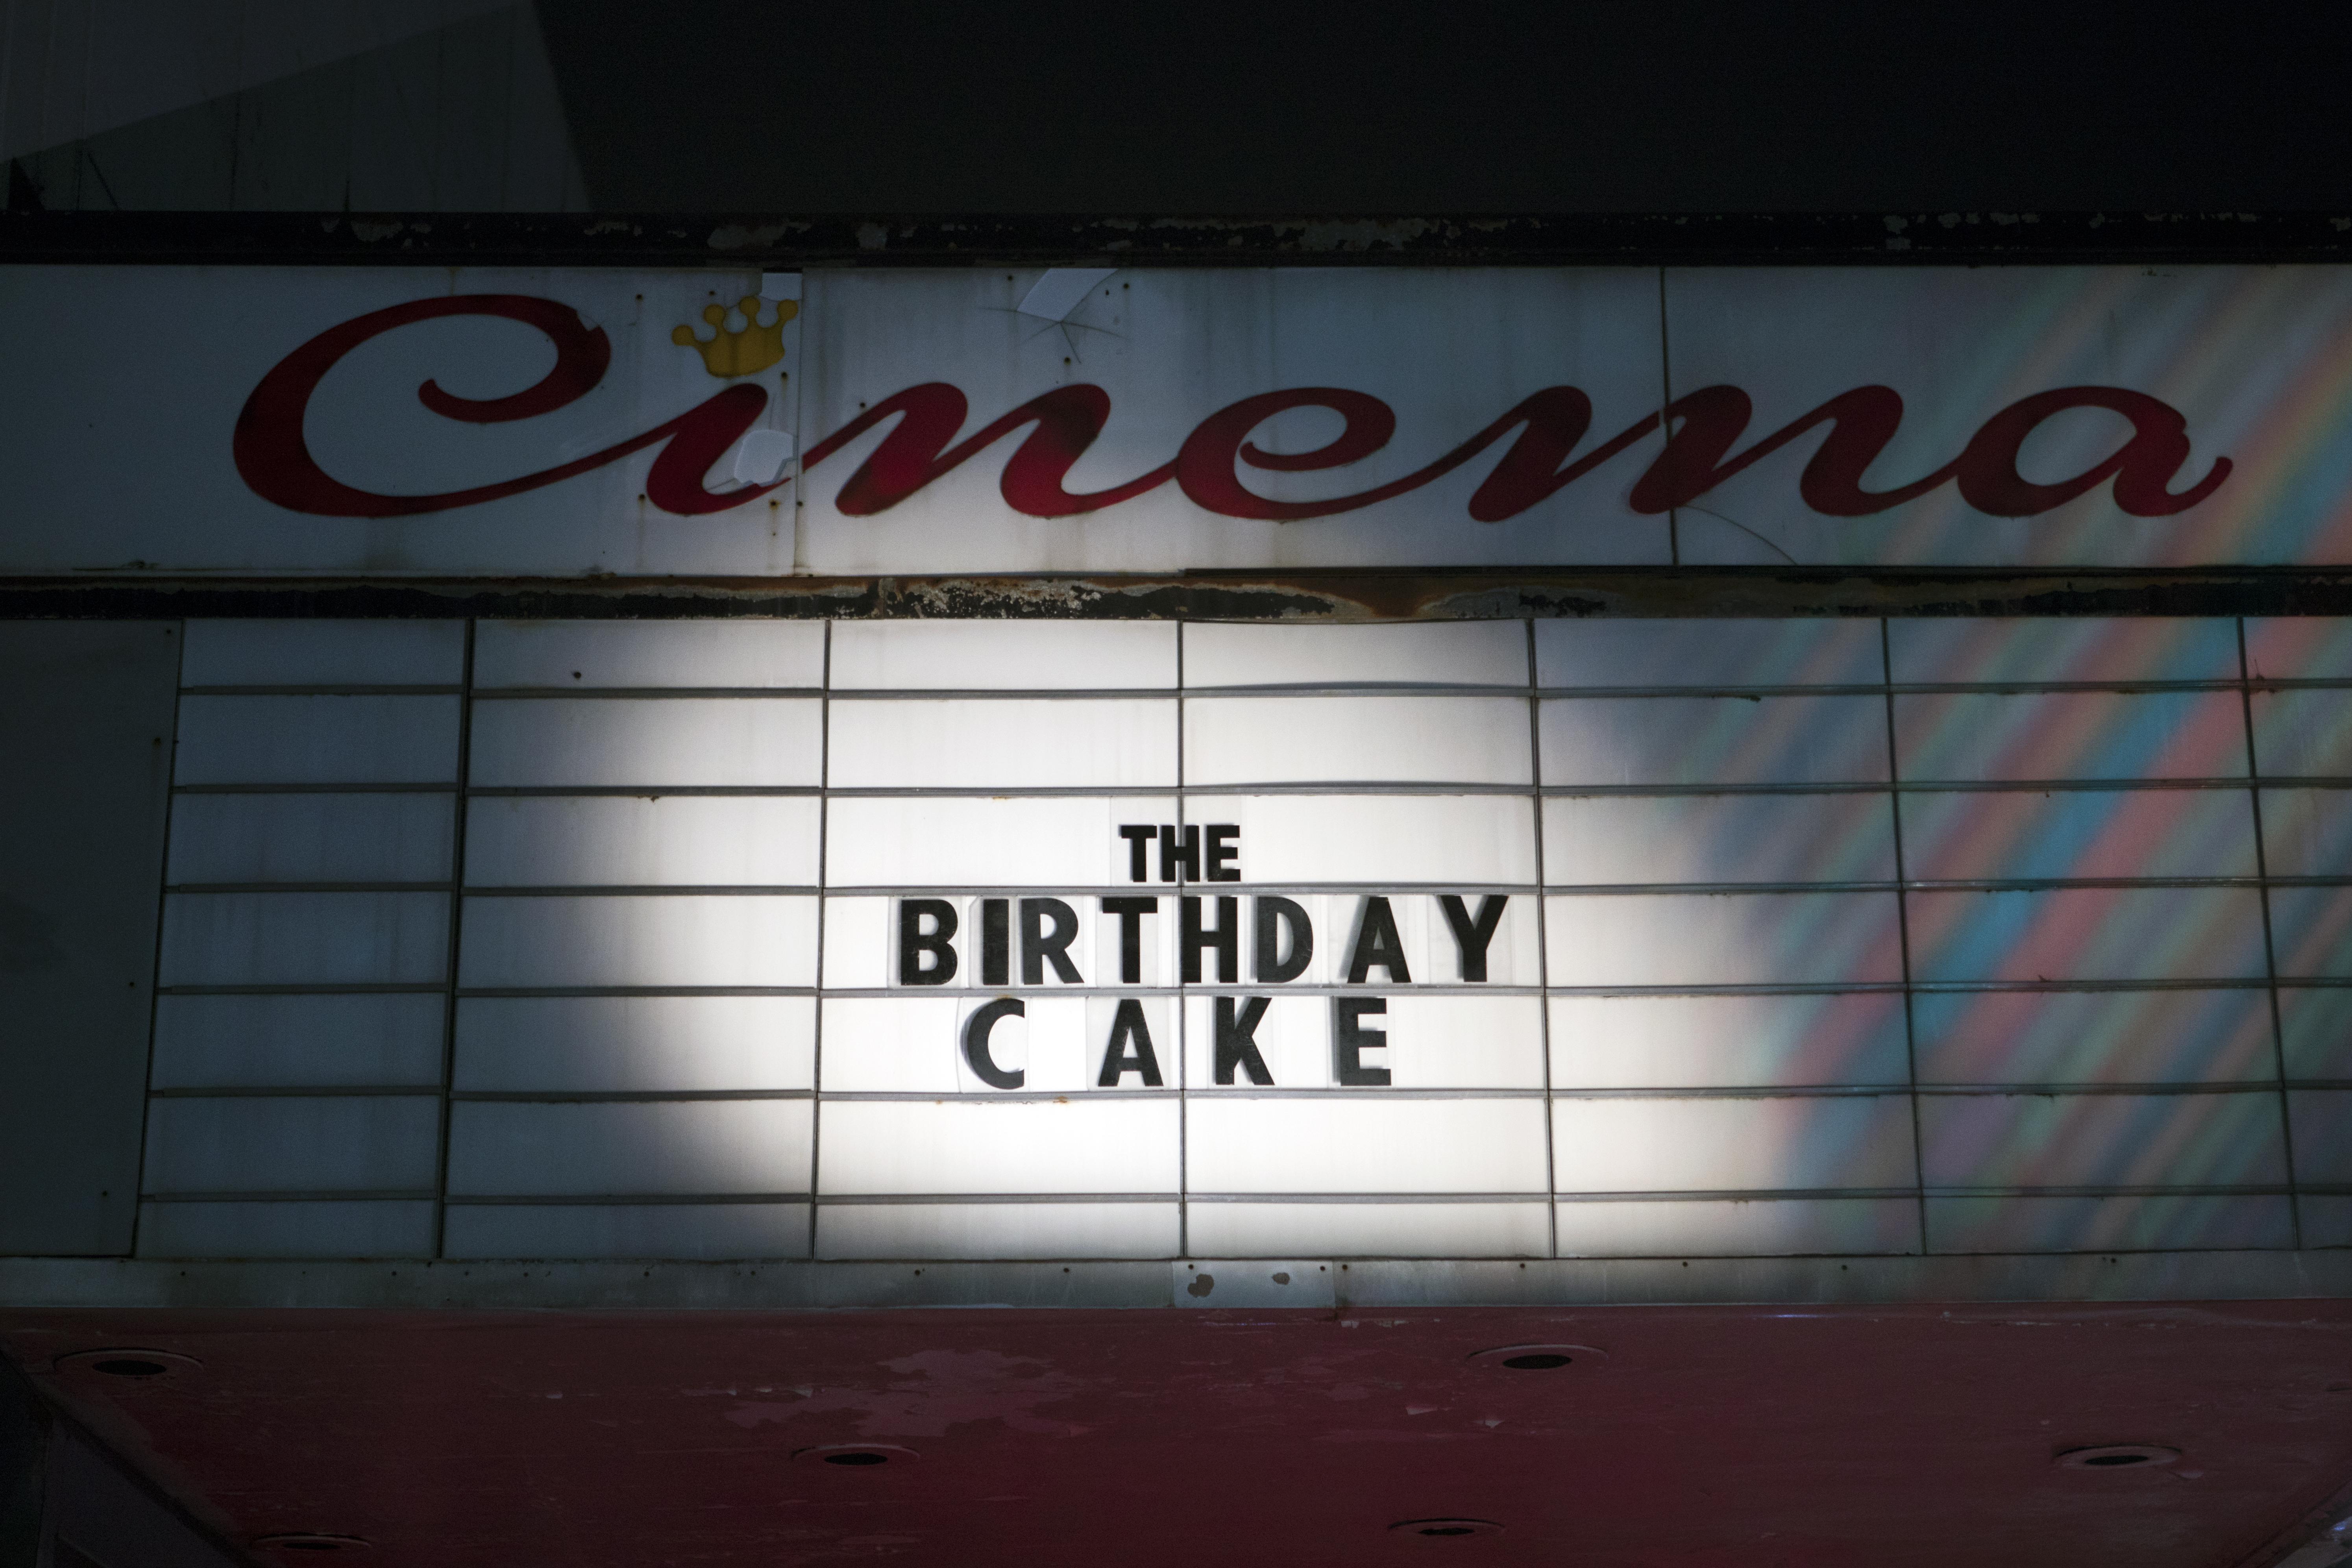 Phim Bánh Sinh Nhật - The Birthday Cake (2021)